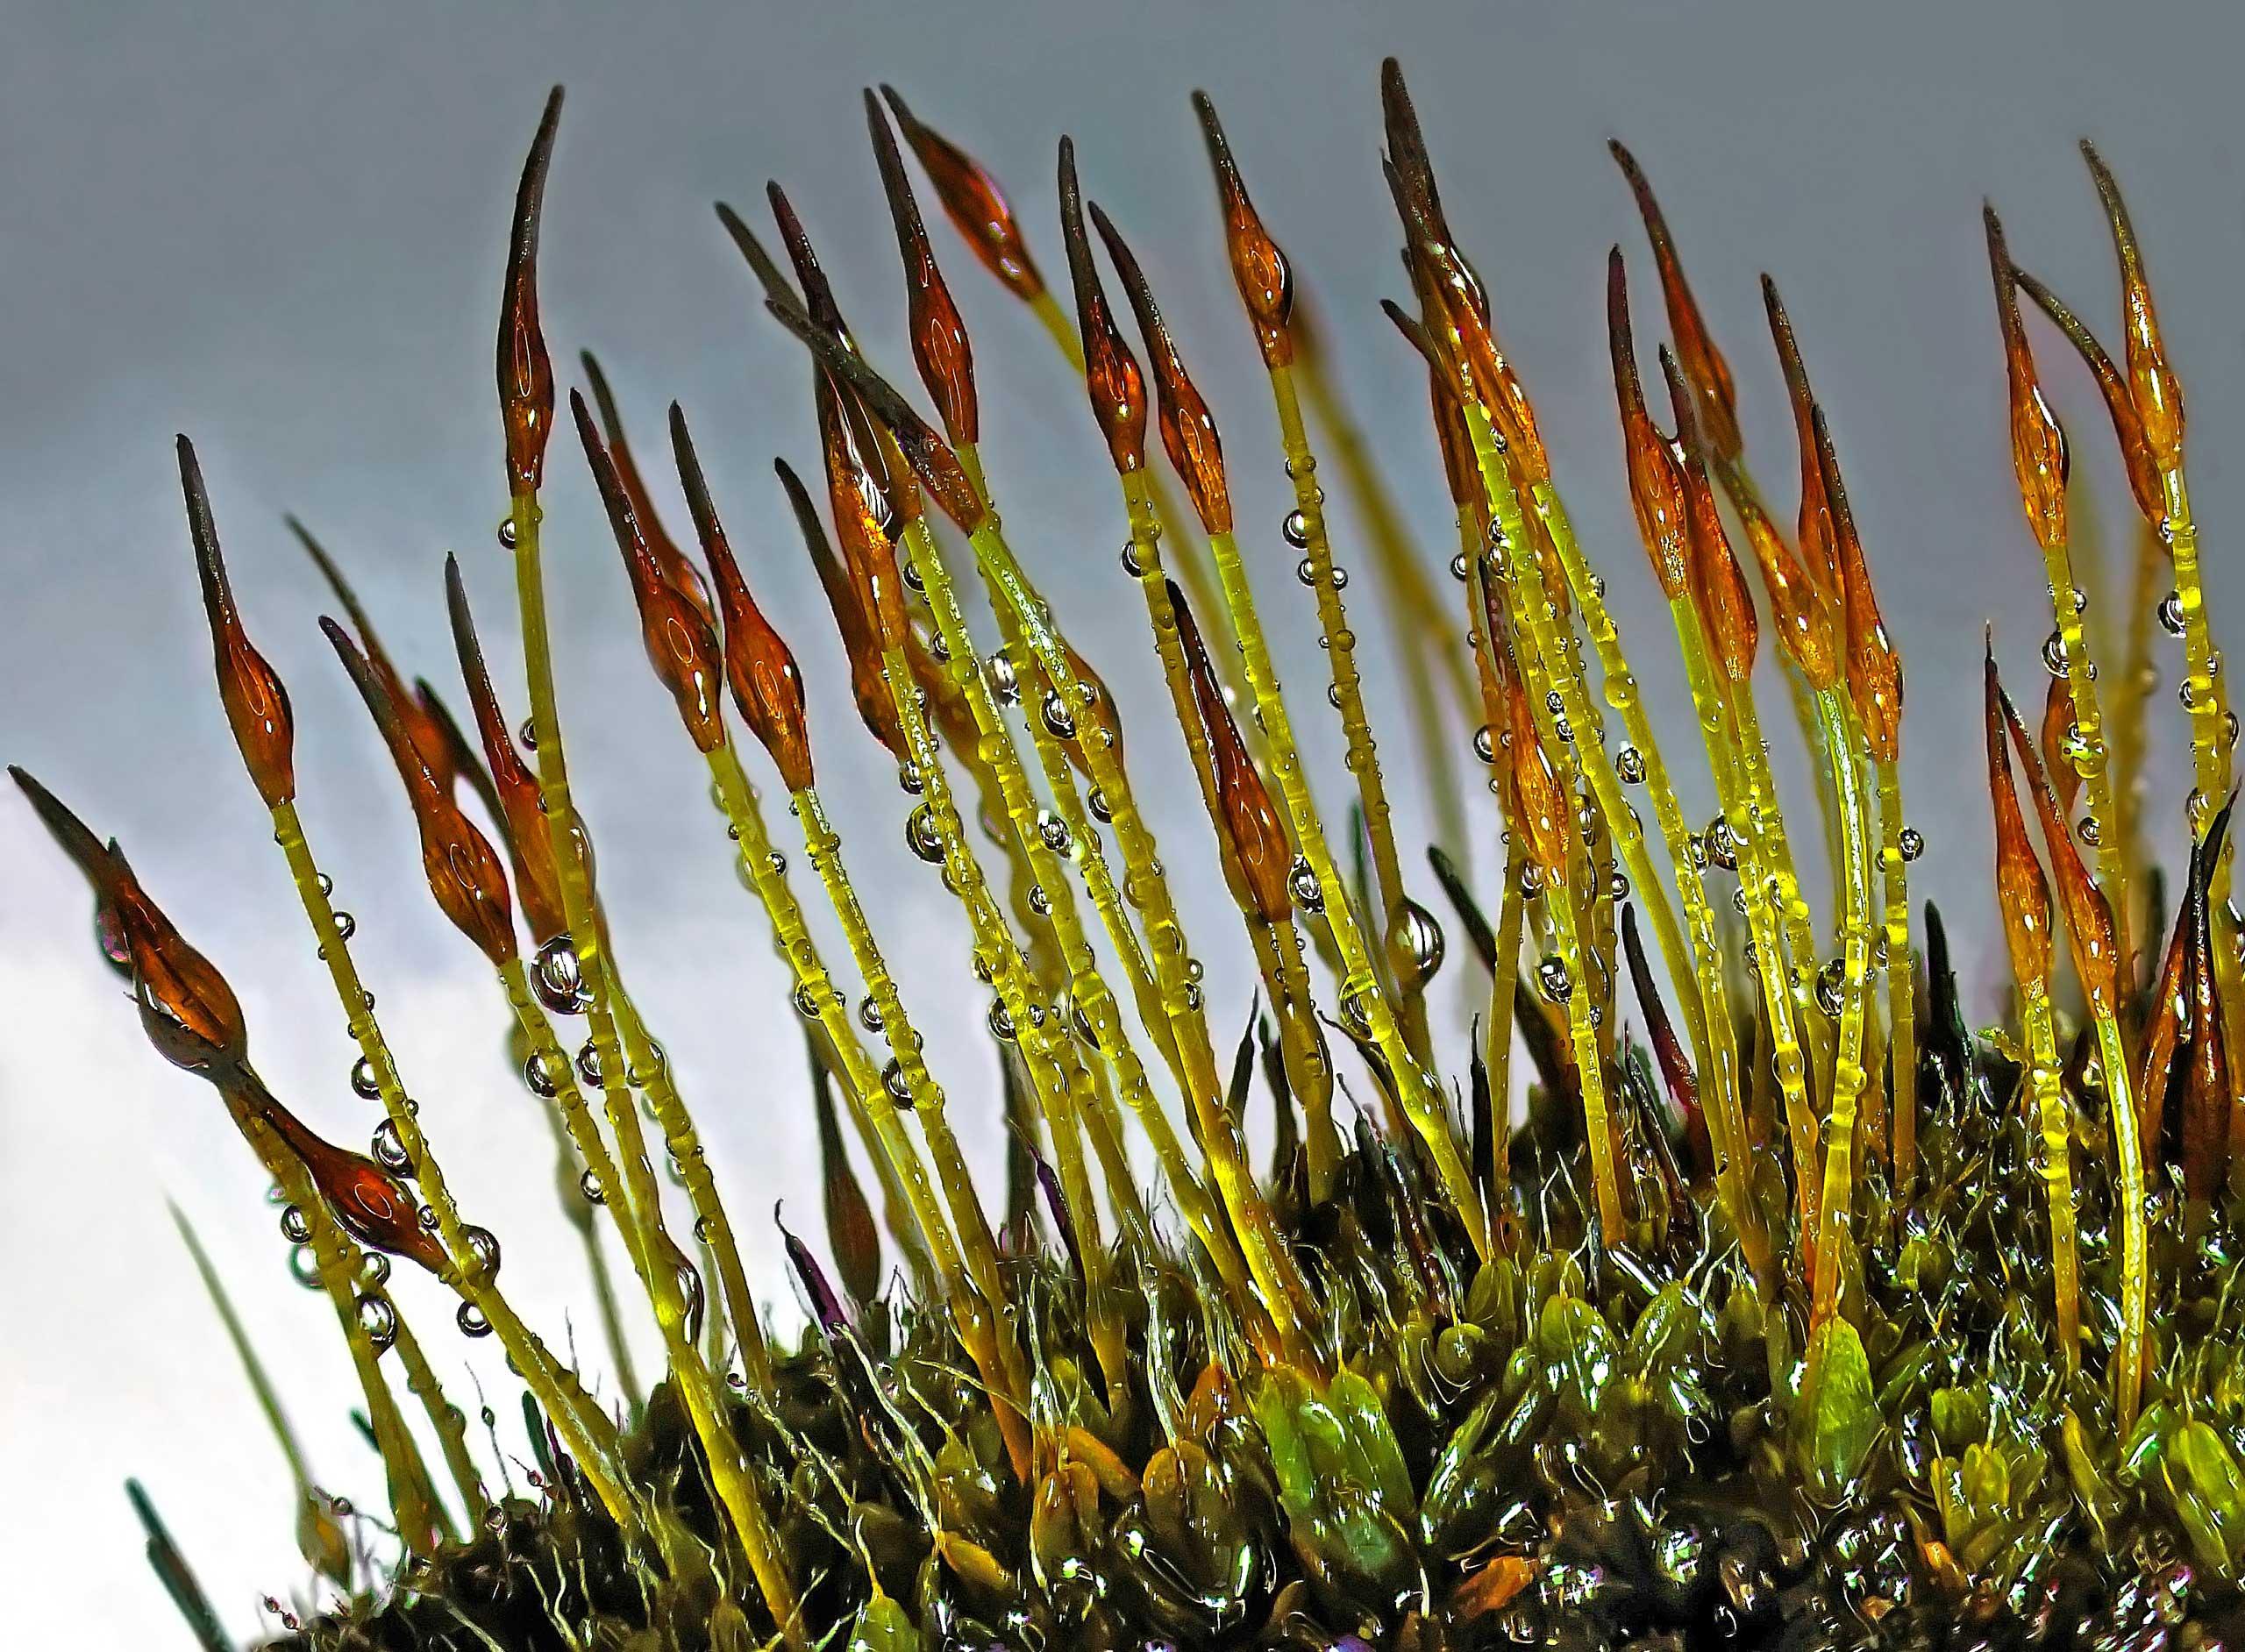 A moss specie called Tortula ruralis.